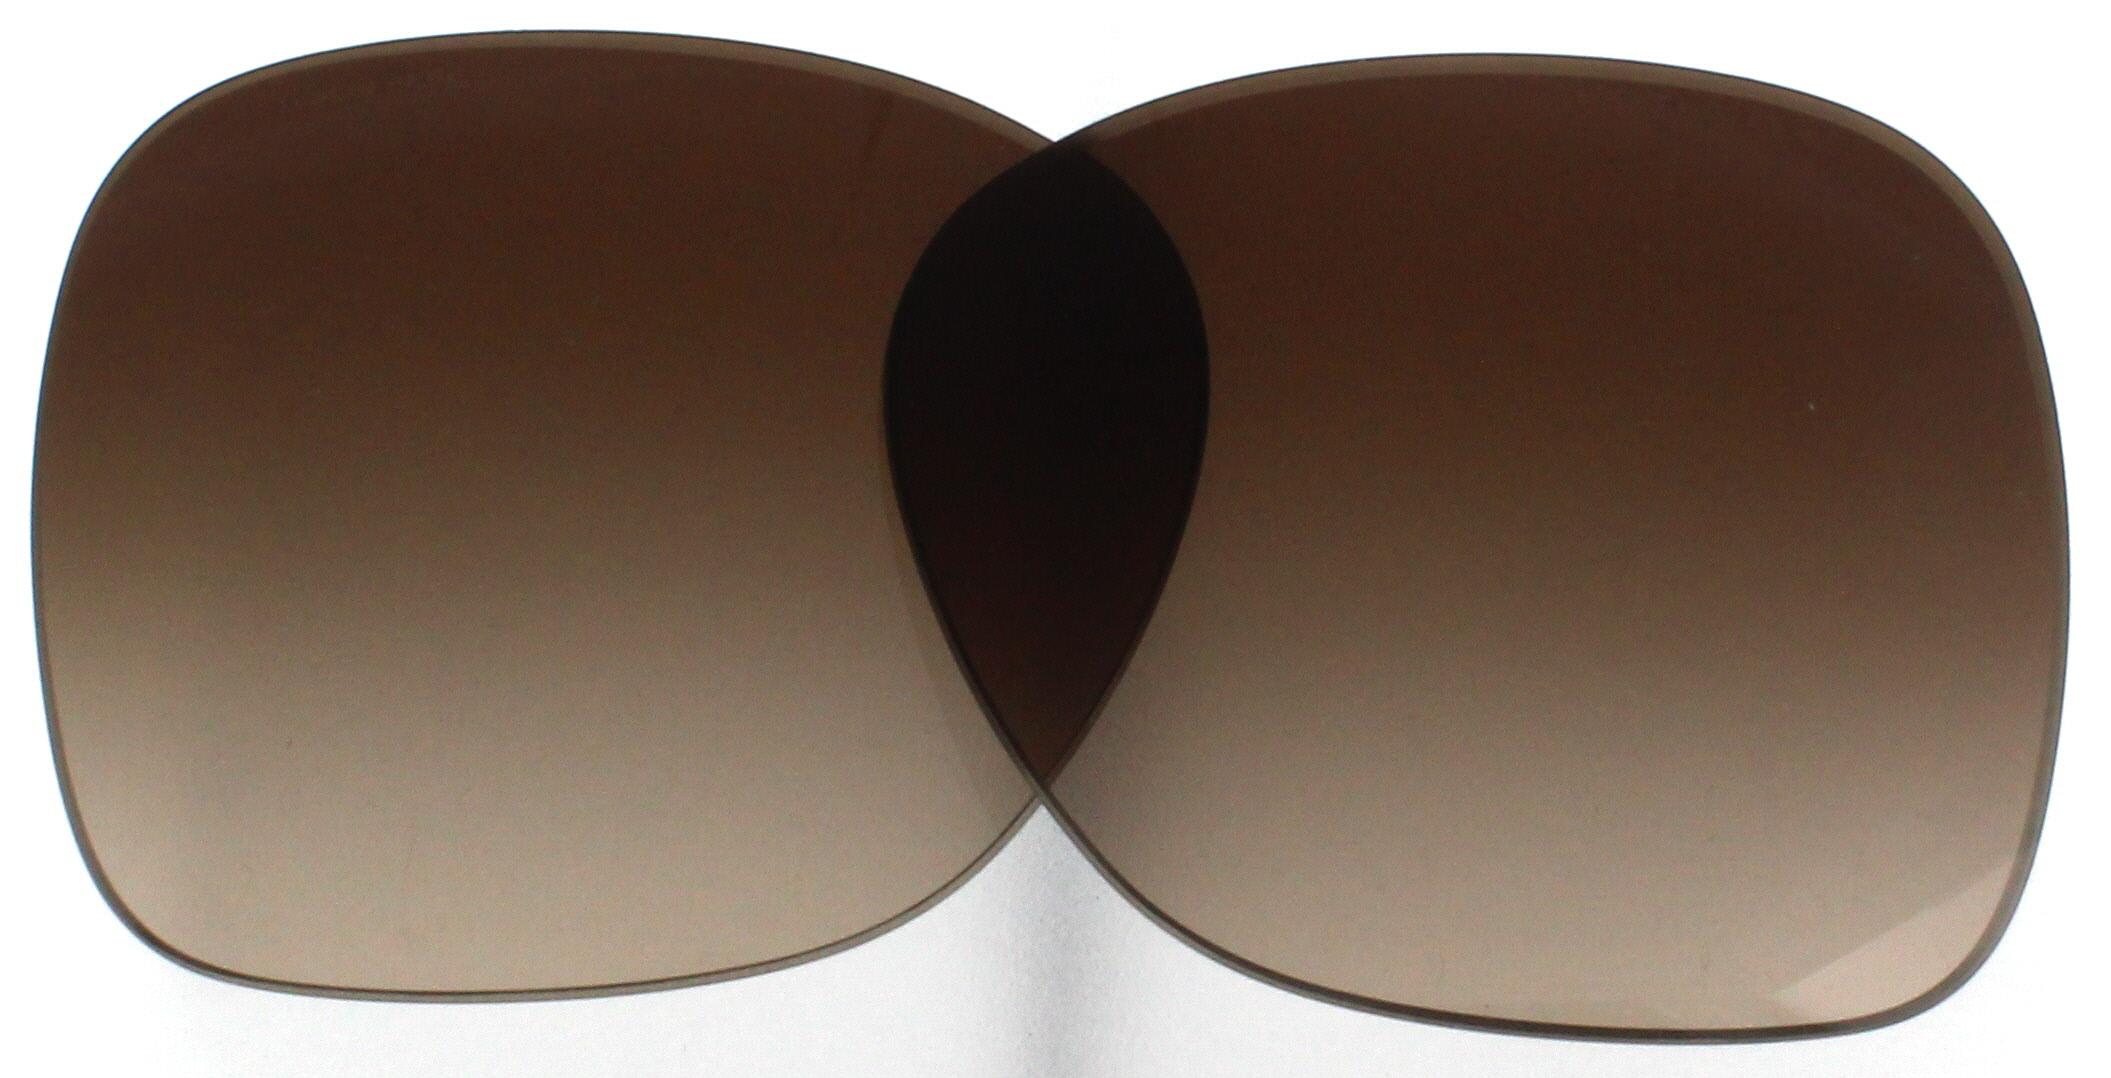 d271a20604 PRADA Replacement Lenses PR32PS Brown Gradient 57mm for sale online ...